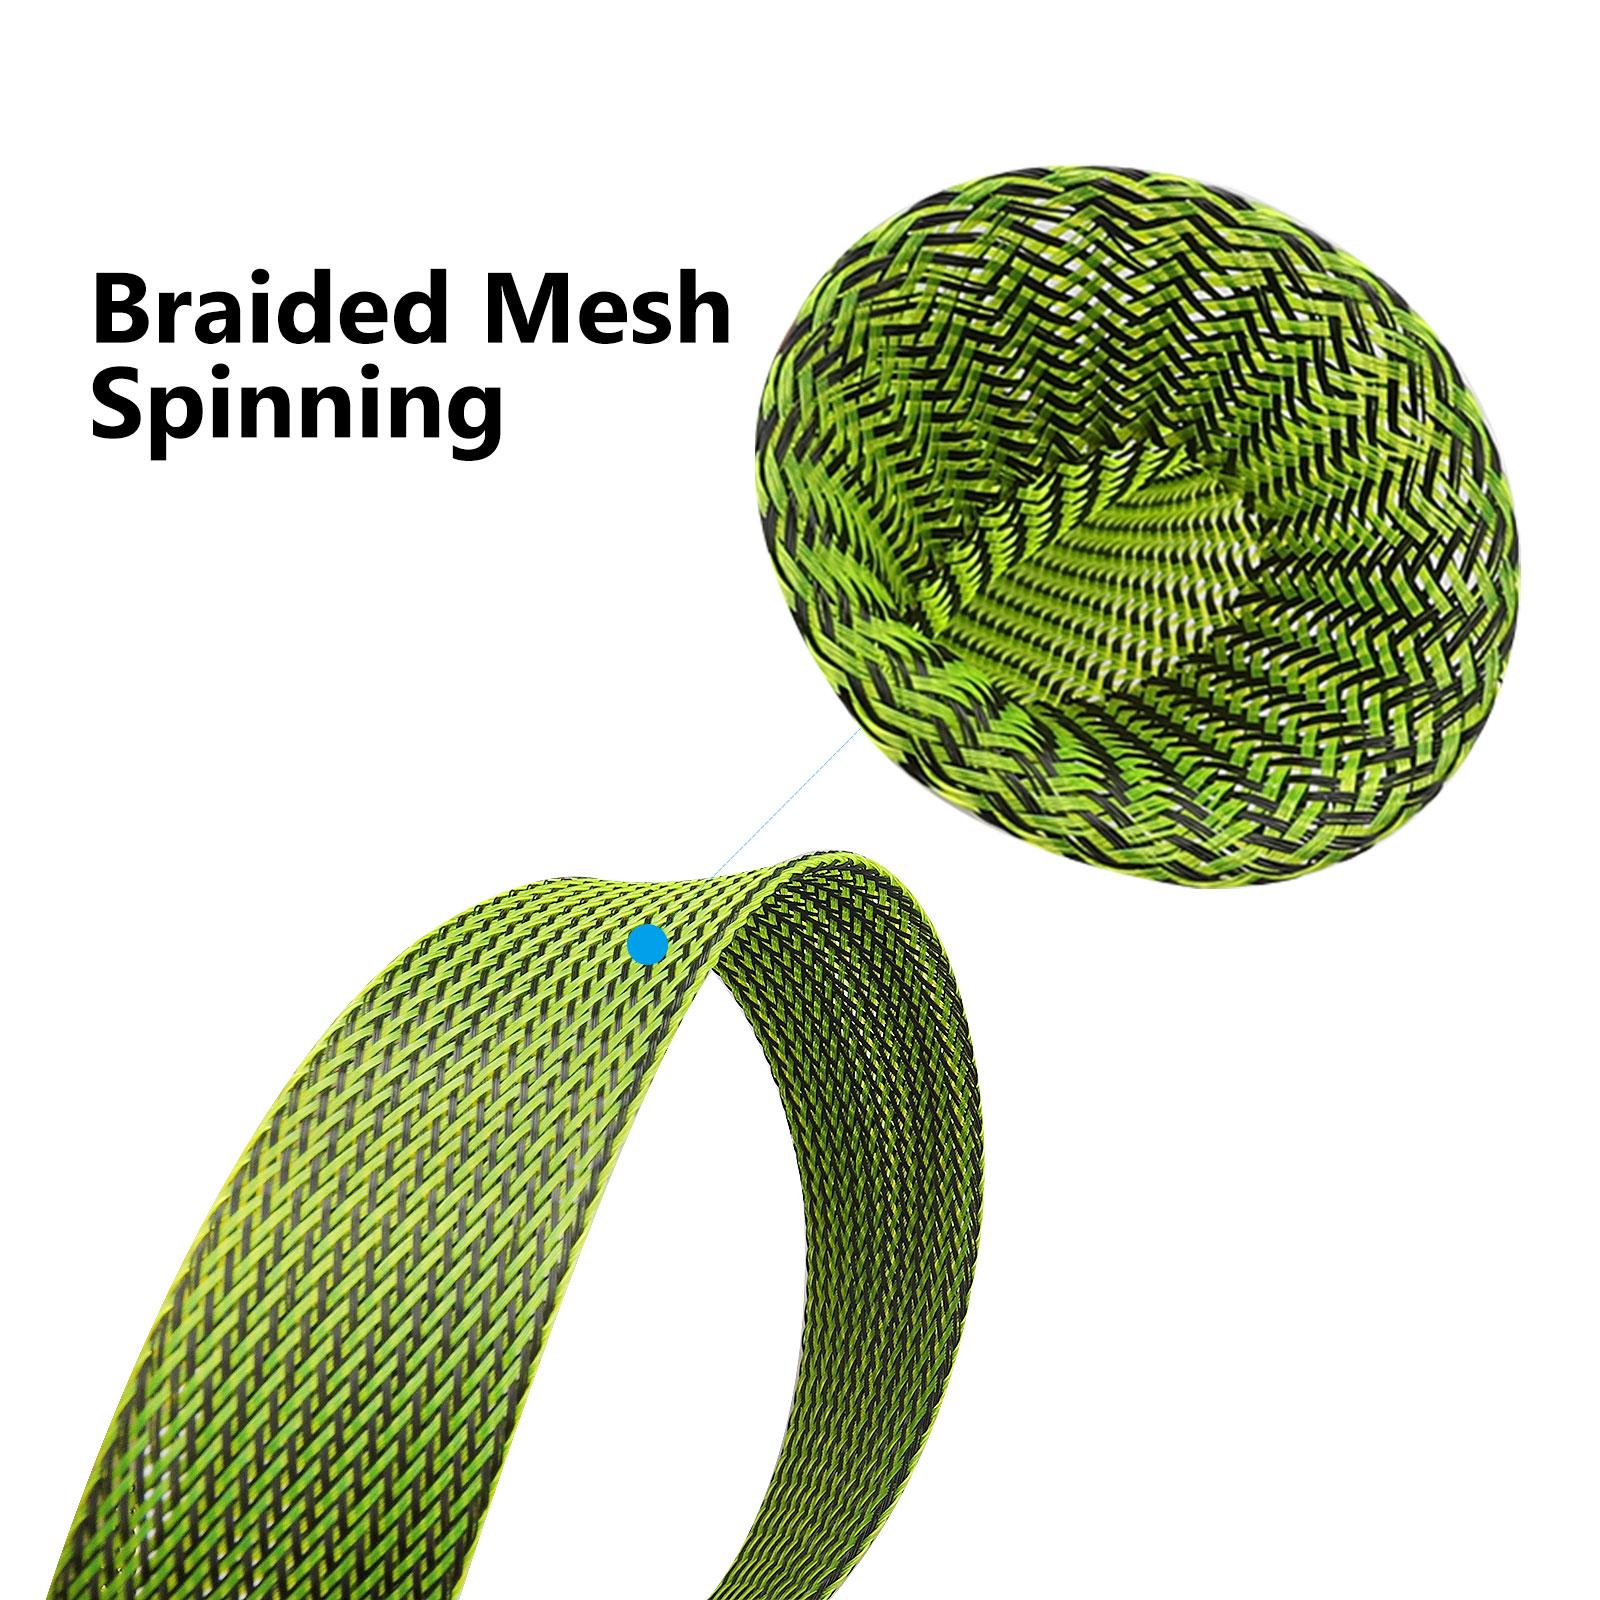 10Pcs-67-039-039-Fishing-Spinning-Rod-Sock-Covers-Braided-Mesh-Rod-Protector-Sleeve-US thumbnail 5